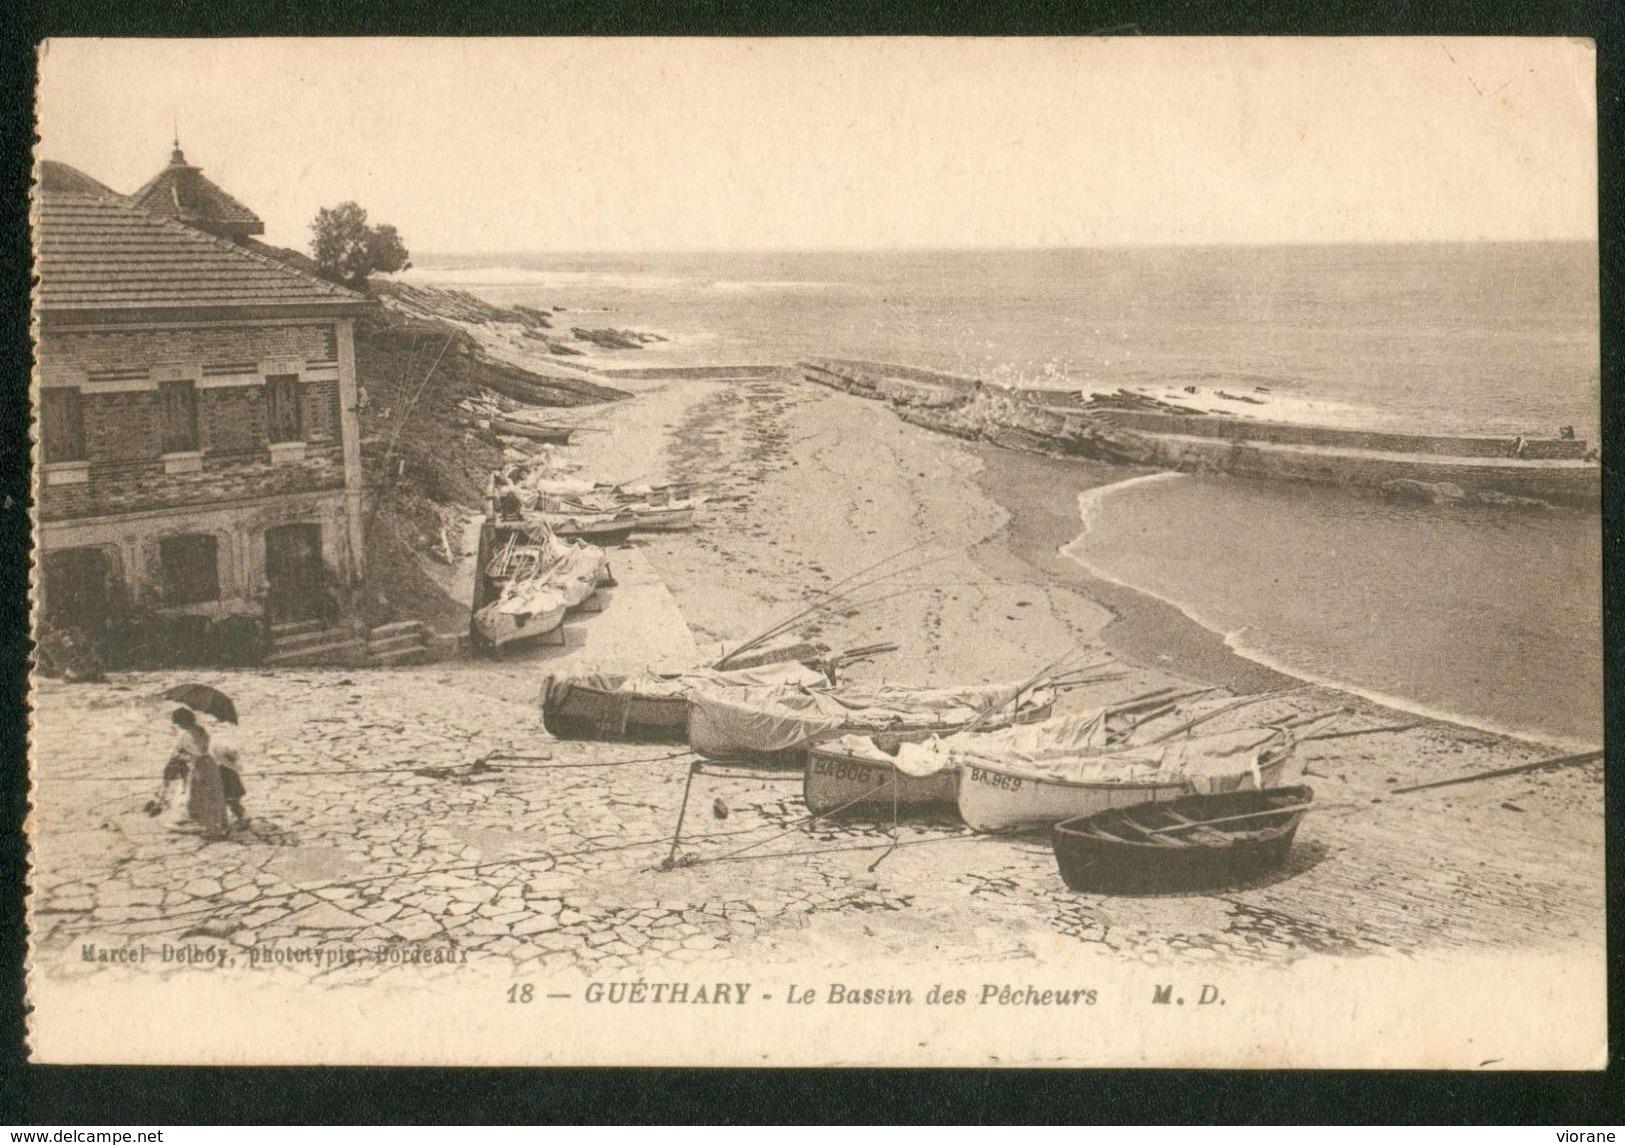 Le Bassin Des Pêcheurs - Guethary